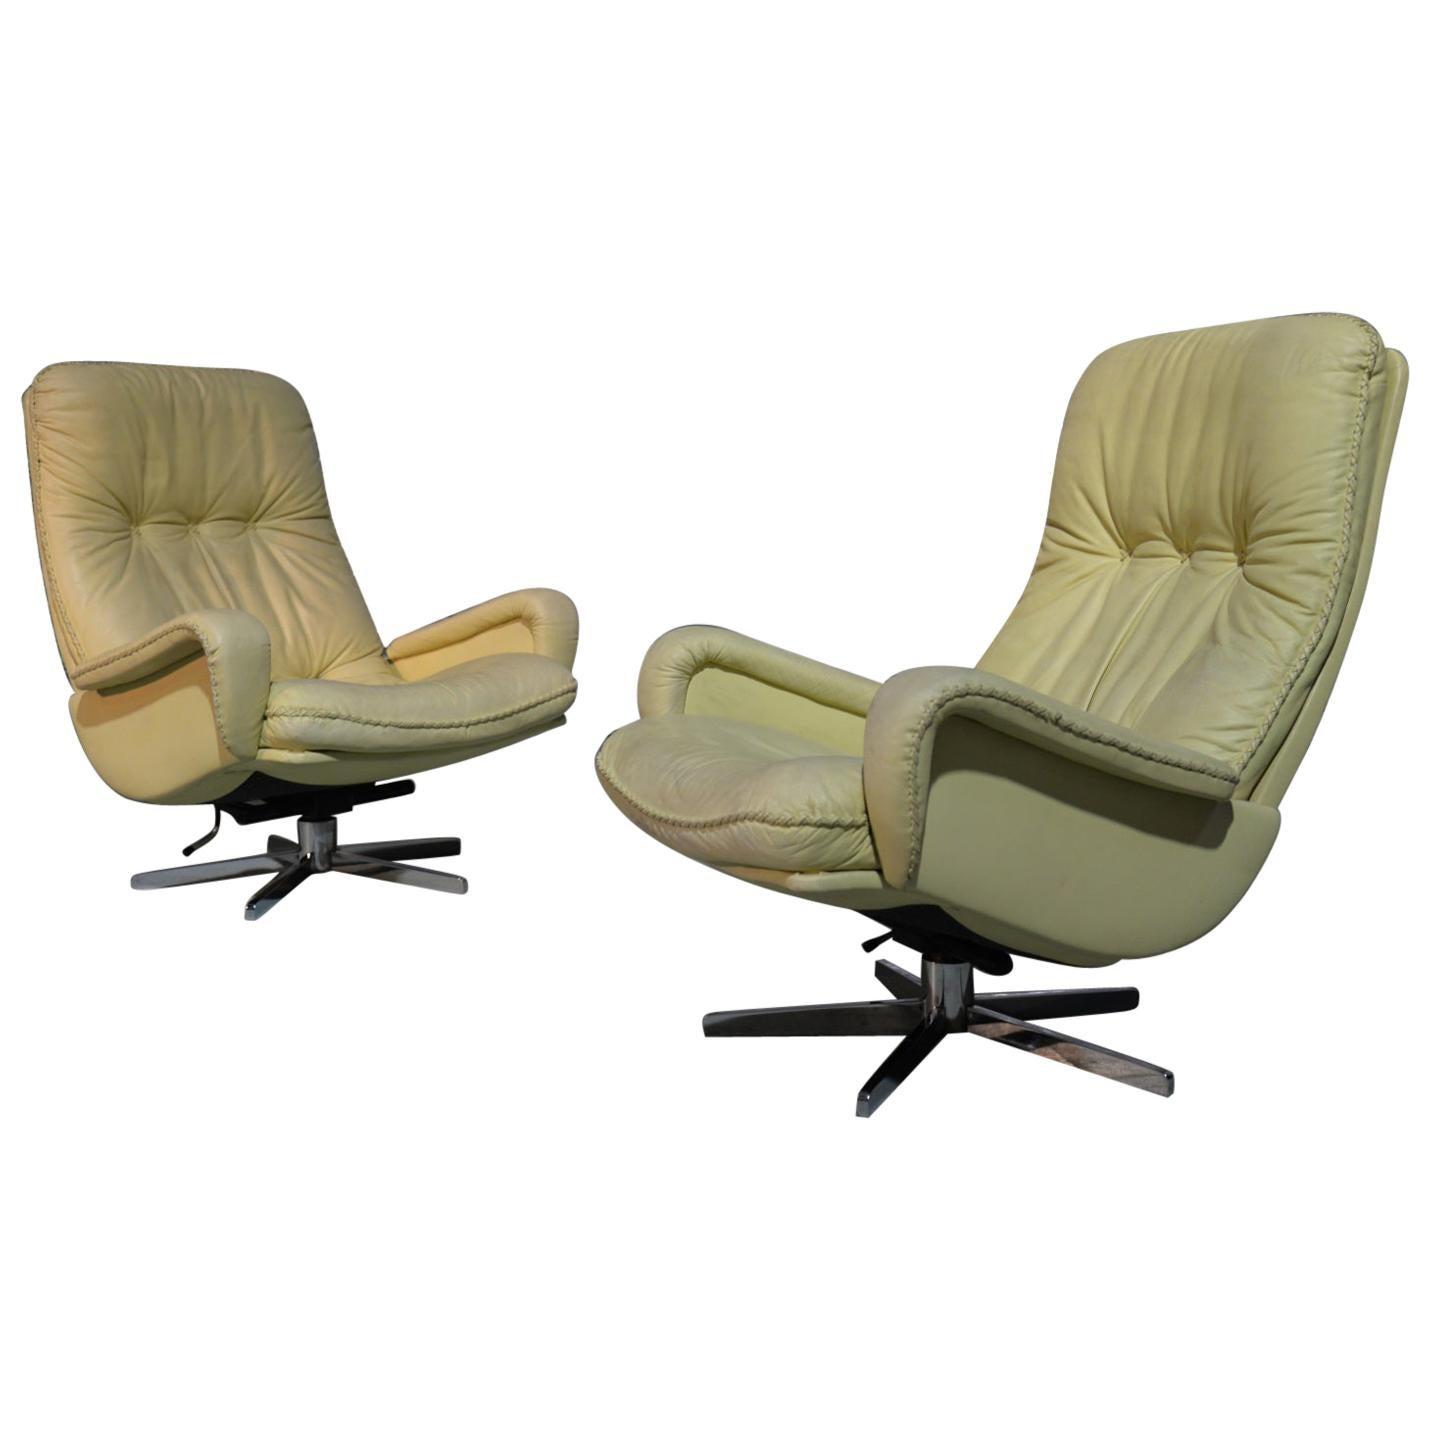 Vintage De Sede S 231 James Bond Swivel Leather Armchairs, Switzerland, 1960s